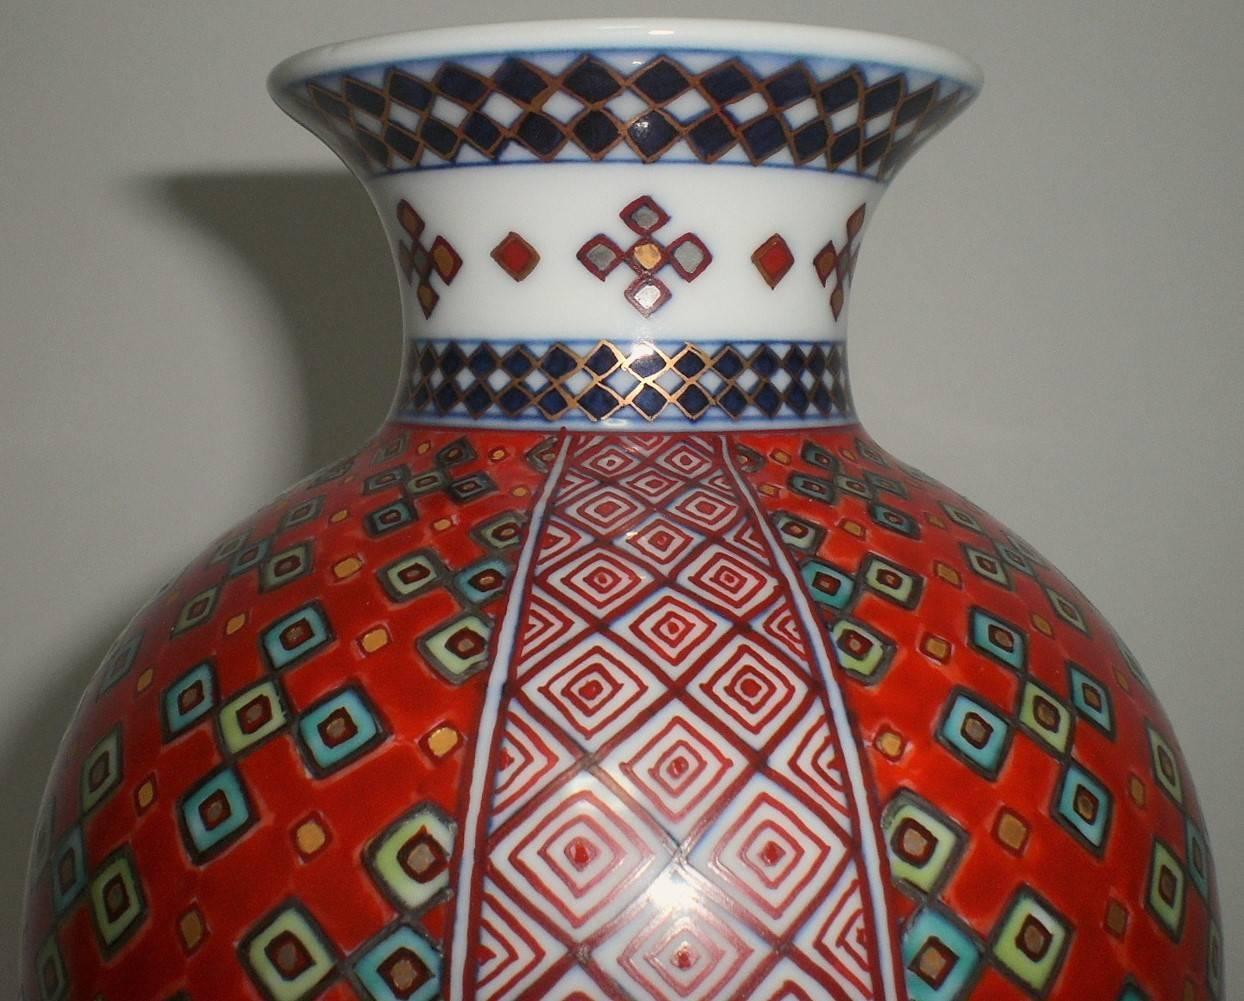 Modern White Ceramic Vase Of Contemporary Decorative Porcelain Vase by Japanese Master Porcelain for Contemporary Decorative Porcelain Vase by Japanese Master Porcelain Artist for Sale at 1stdibs